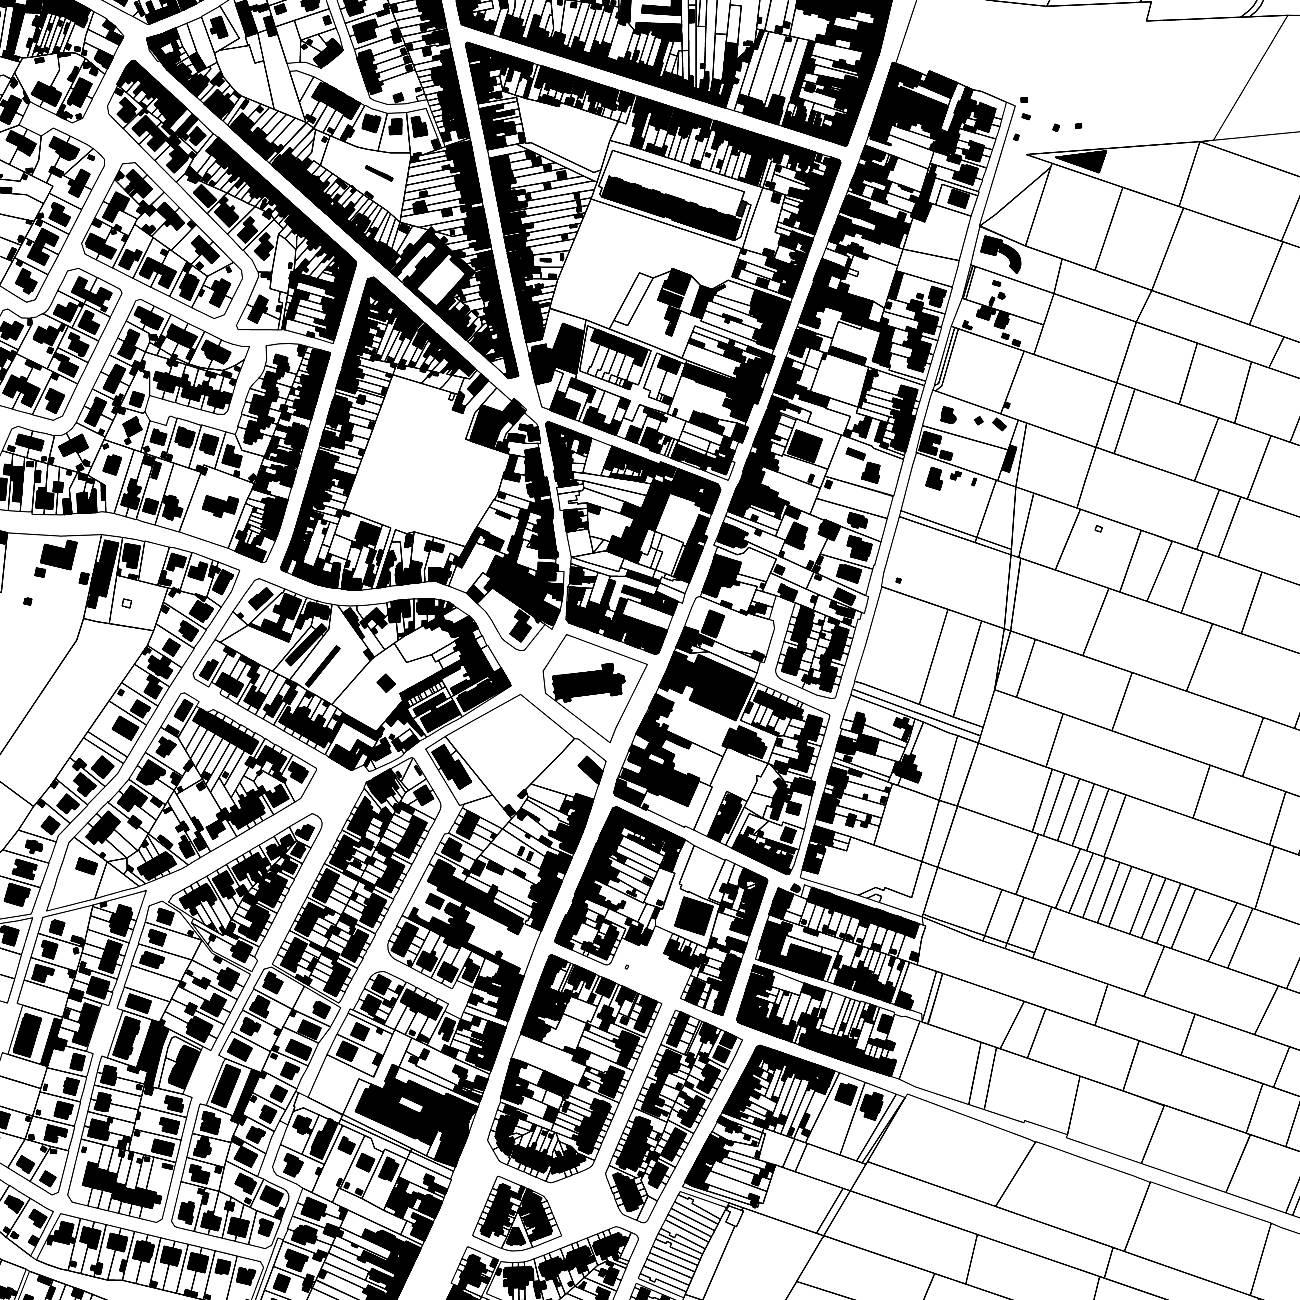 O.L. Vrouweplein, gemeenschapscentrum, Kruibeke-1835554948